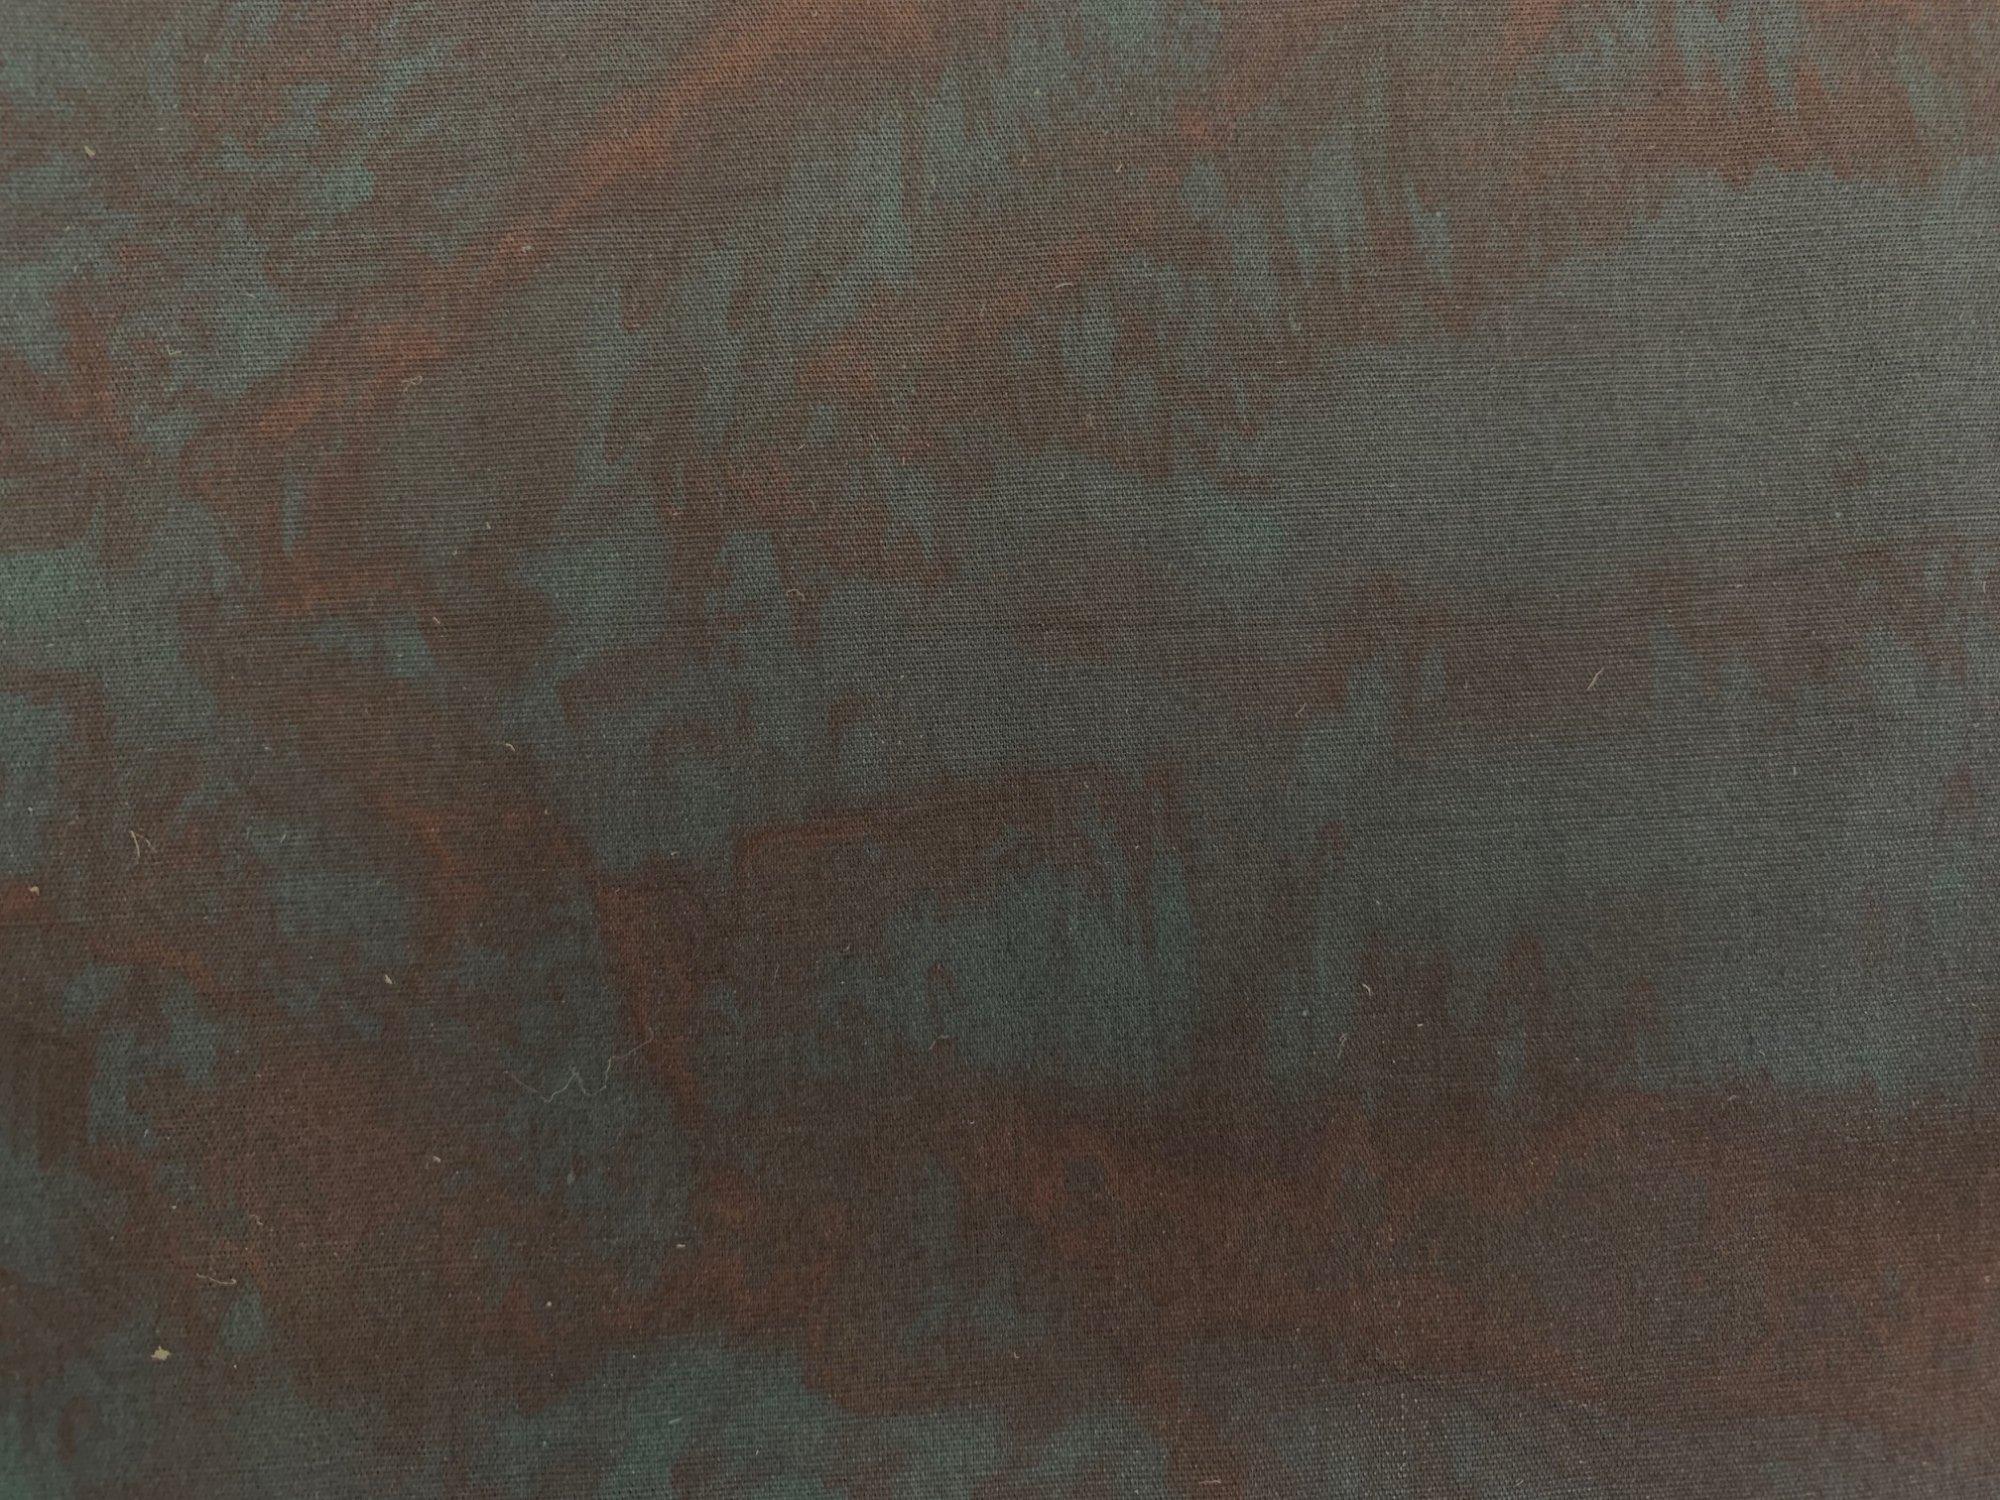 1895-702-Deep Emerald Bali Batiks